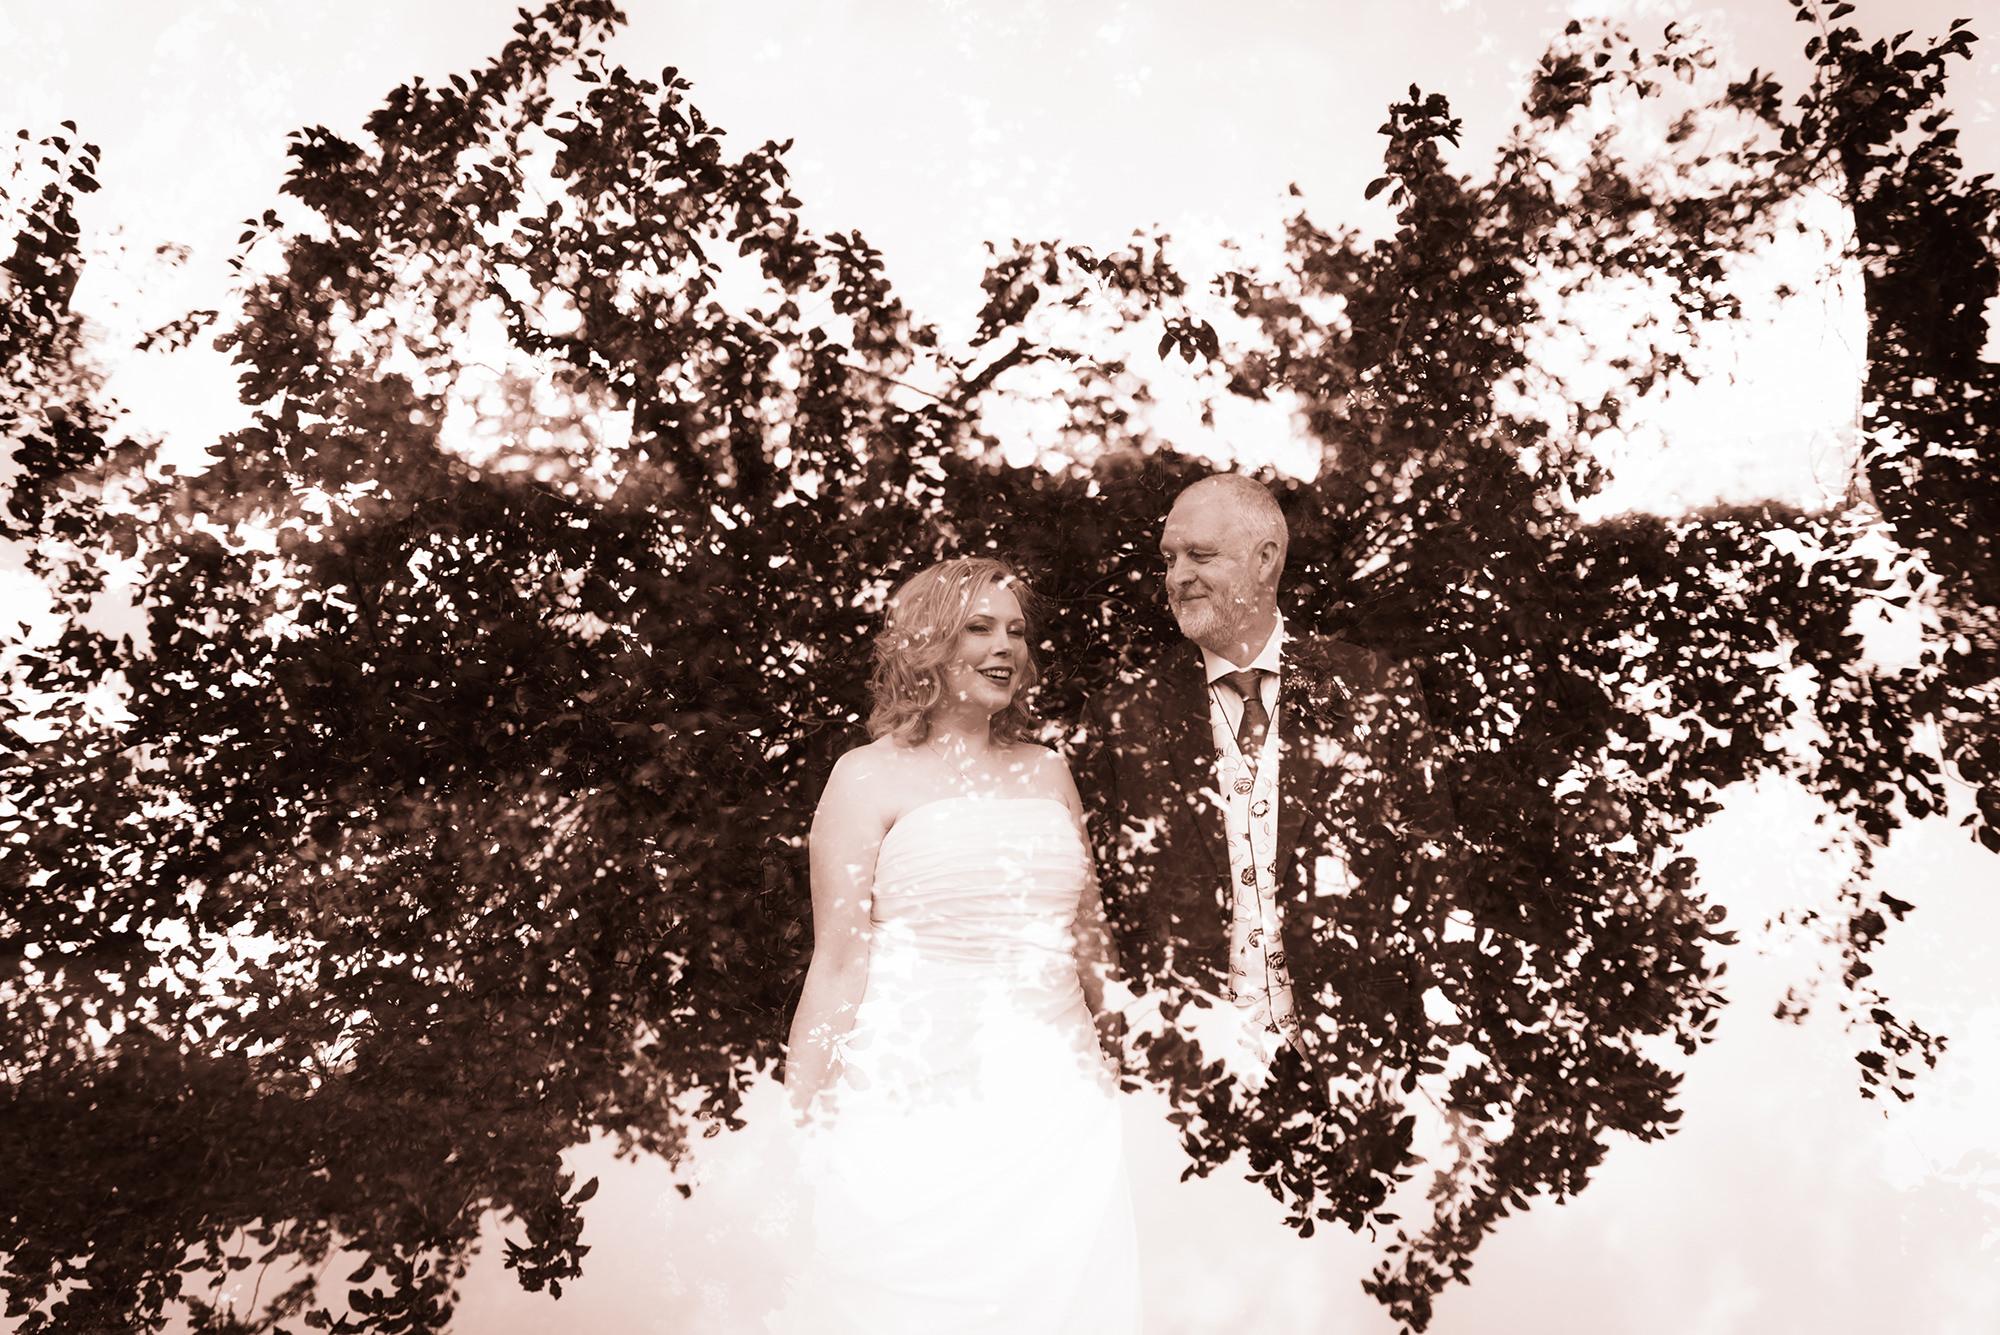 artistic wedding photography scotland